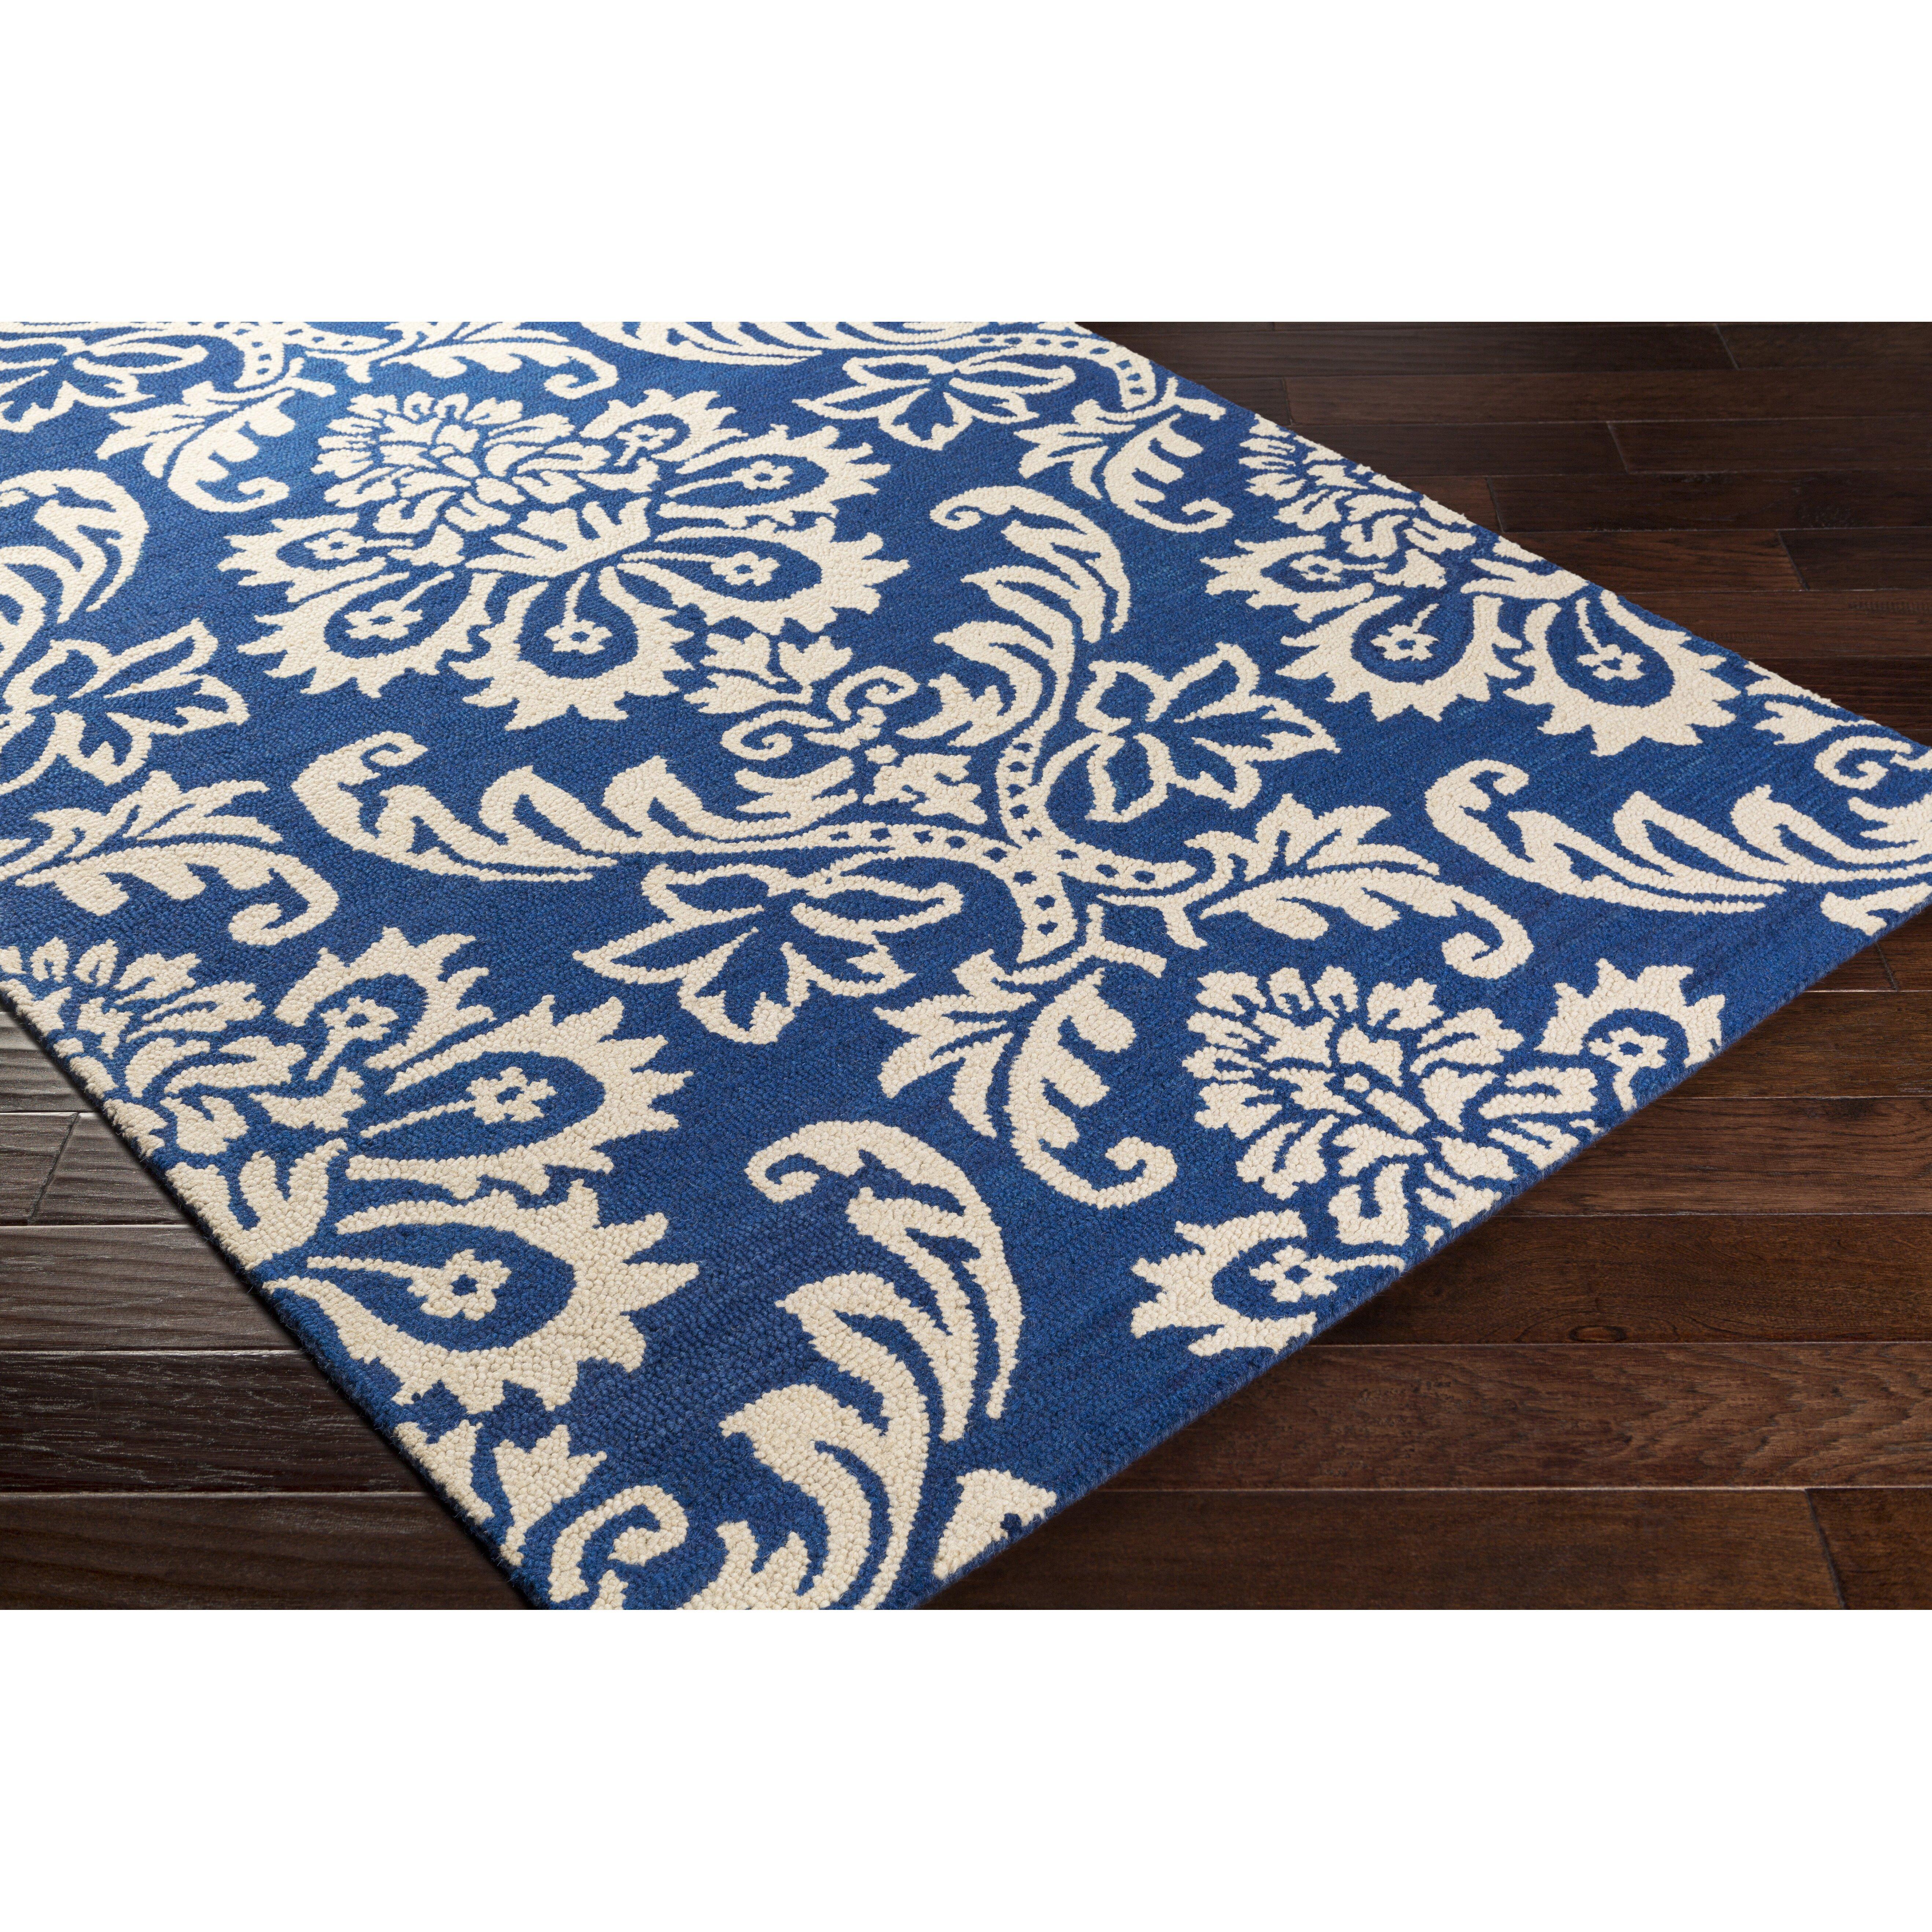 artistic weavers rhodes luna hand tufted navy off white area rug reviews wayfair. Black Bedroom Furniture Sets. Home Design Ideas